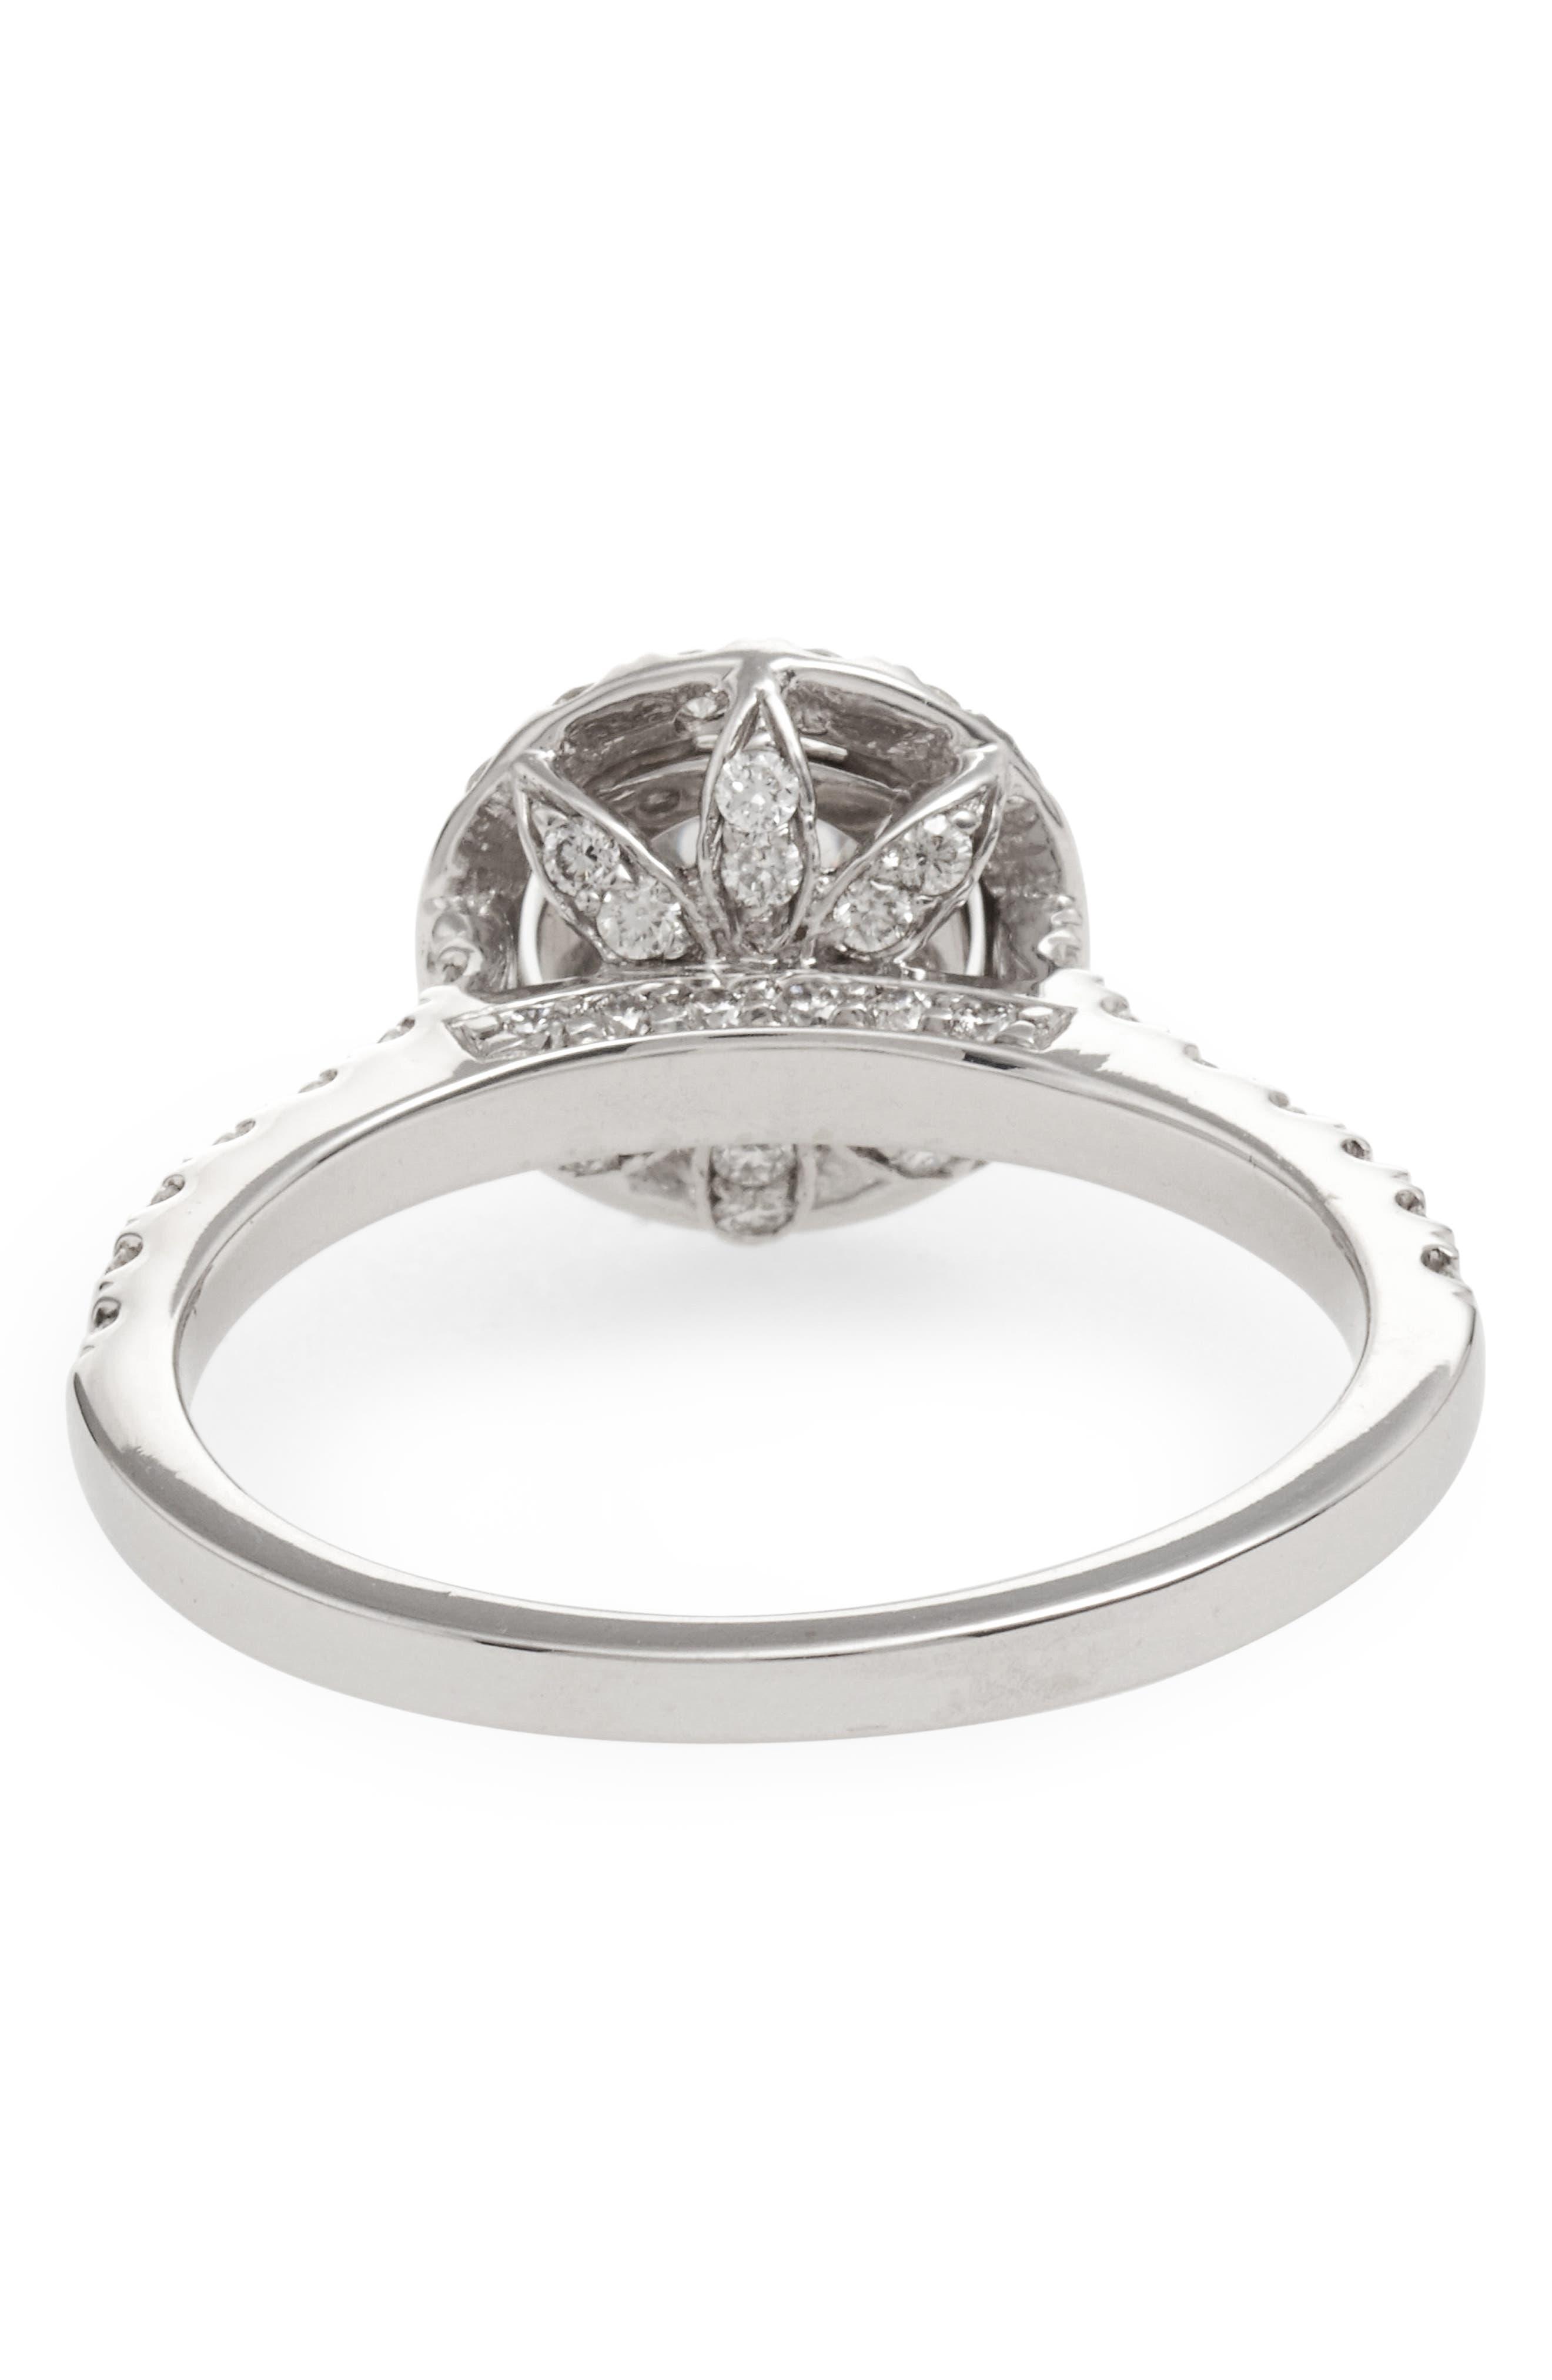 Pavé Diamond Leaf Engagement Ring Setting,                             Alternate thumbnail 3, color,                             WHITE GOLD